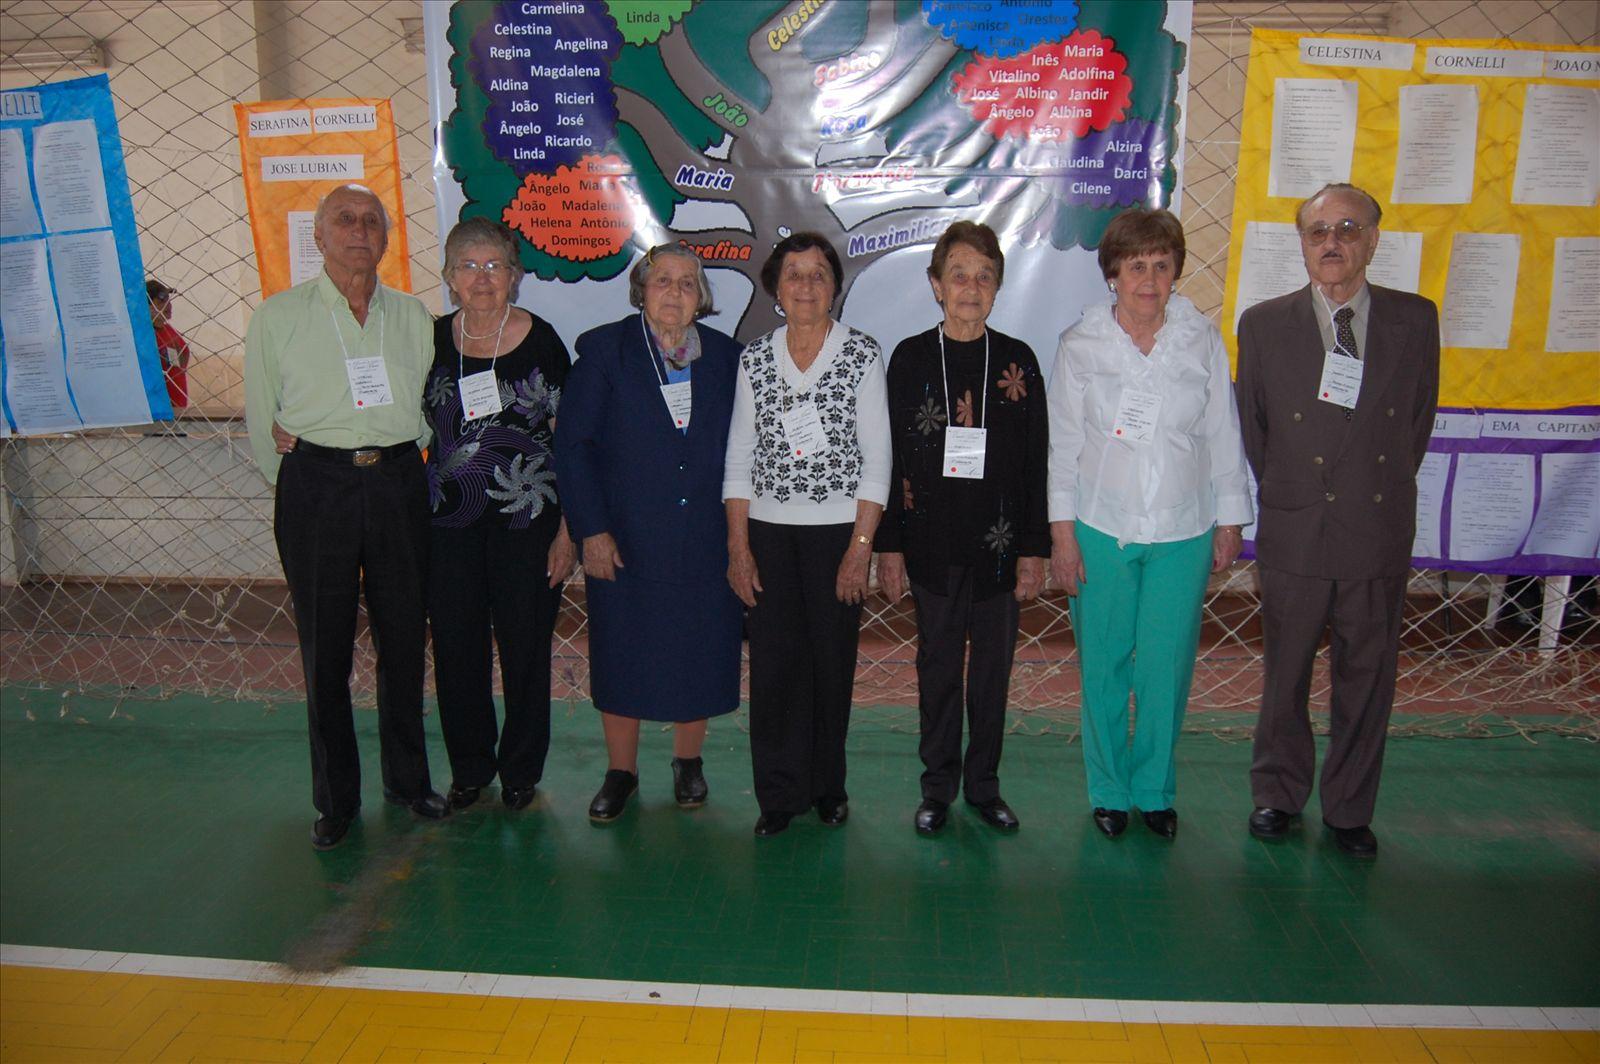 2º Encontro Família Cornelli - 11.10.2009 (70)_0